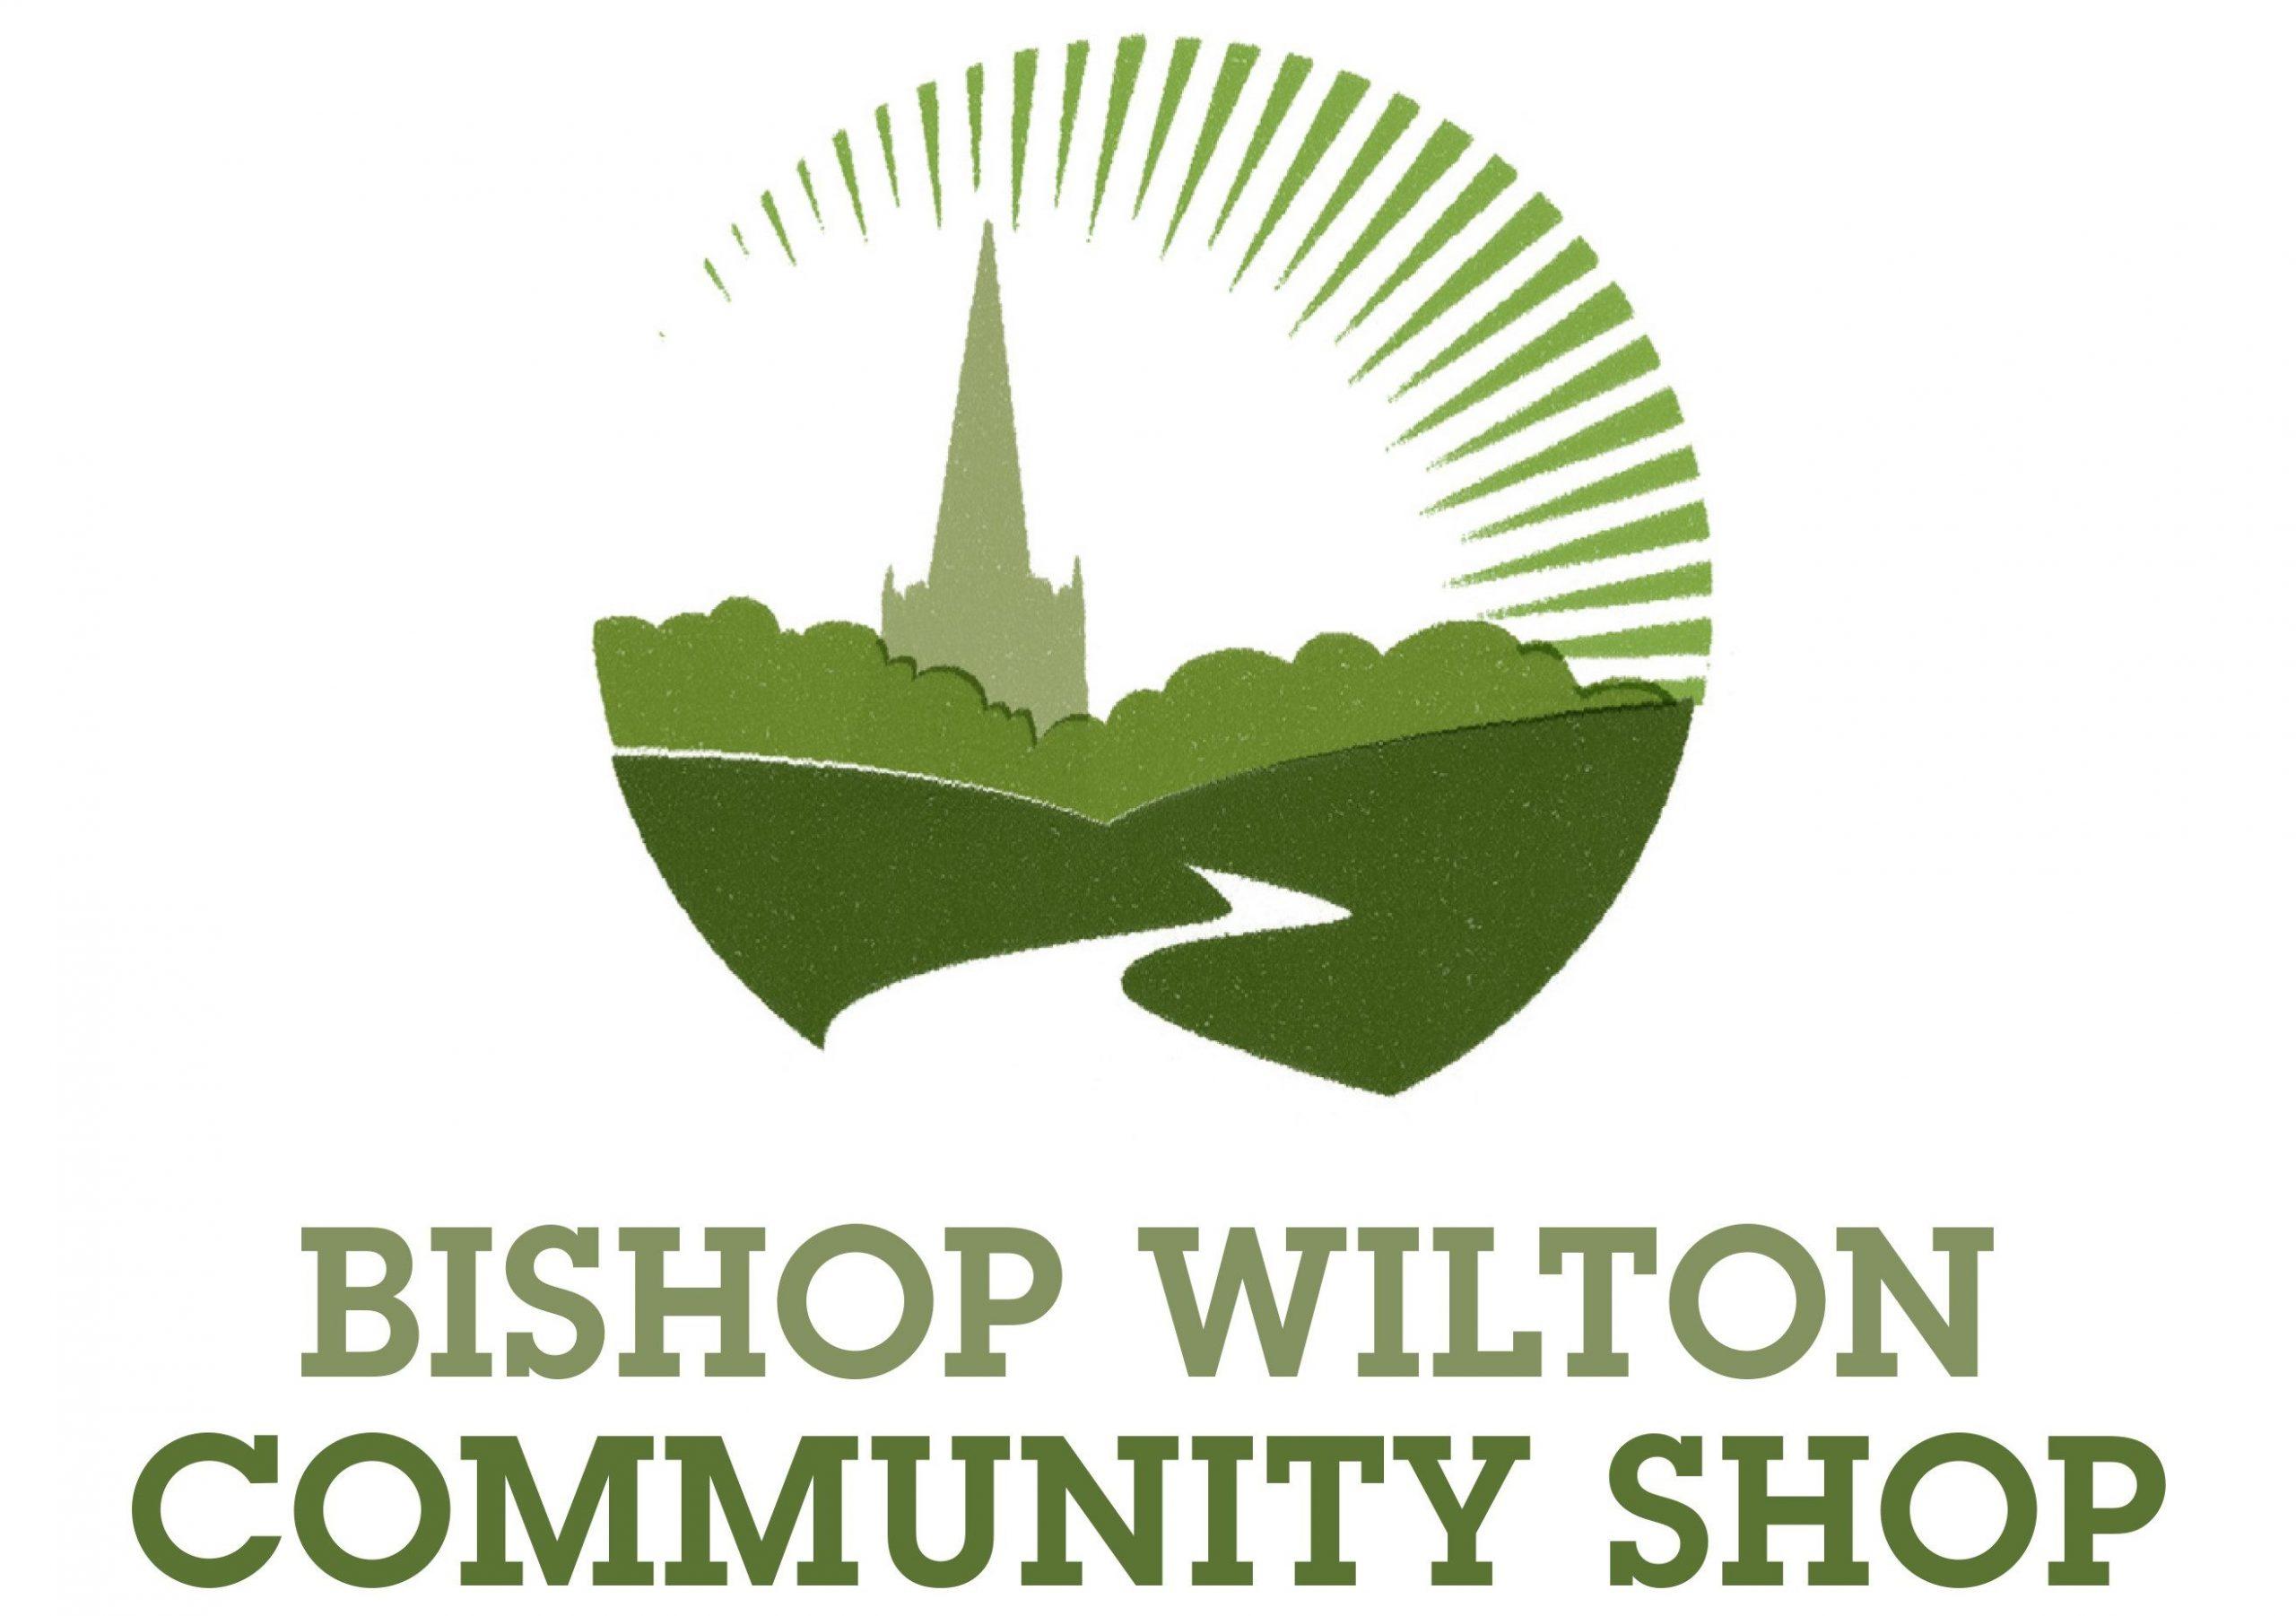 Bishop Wilton Community Shop